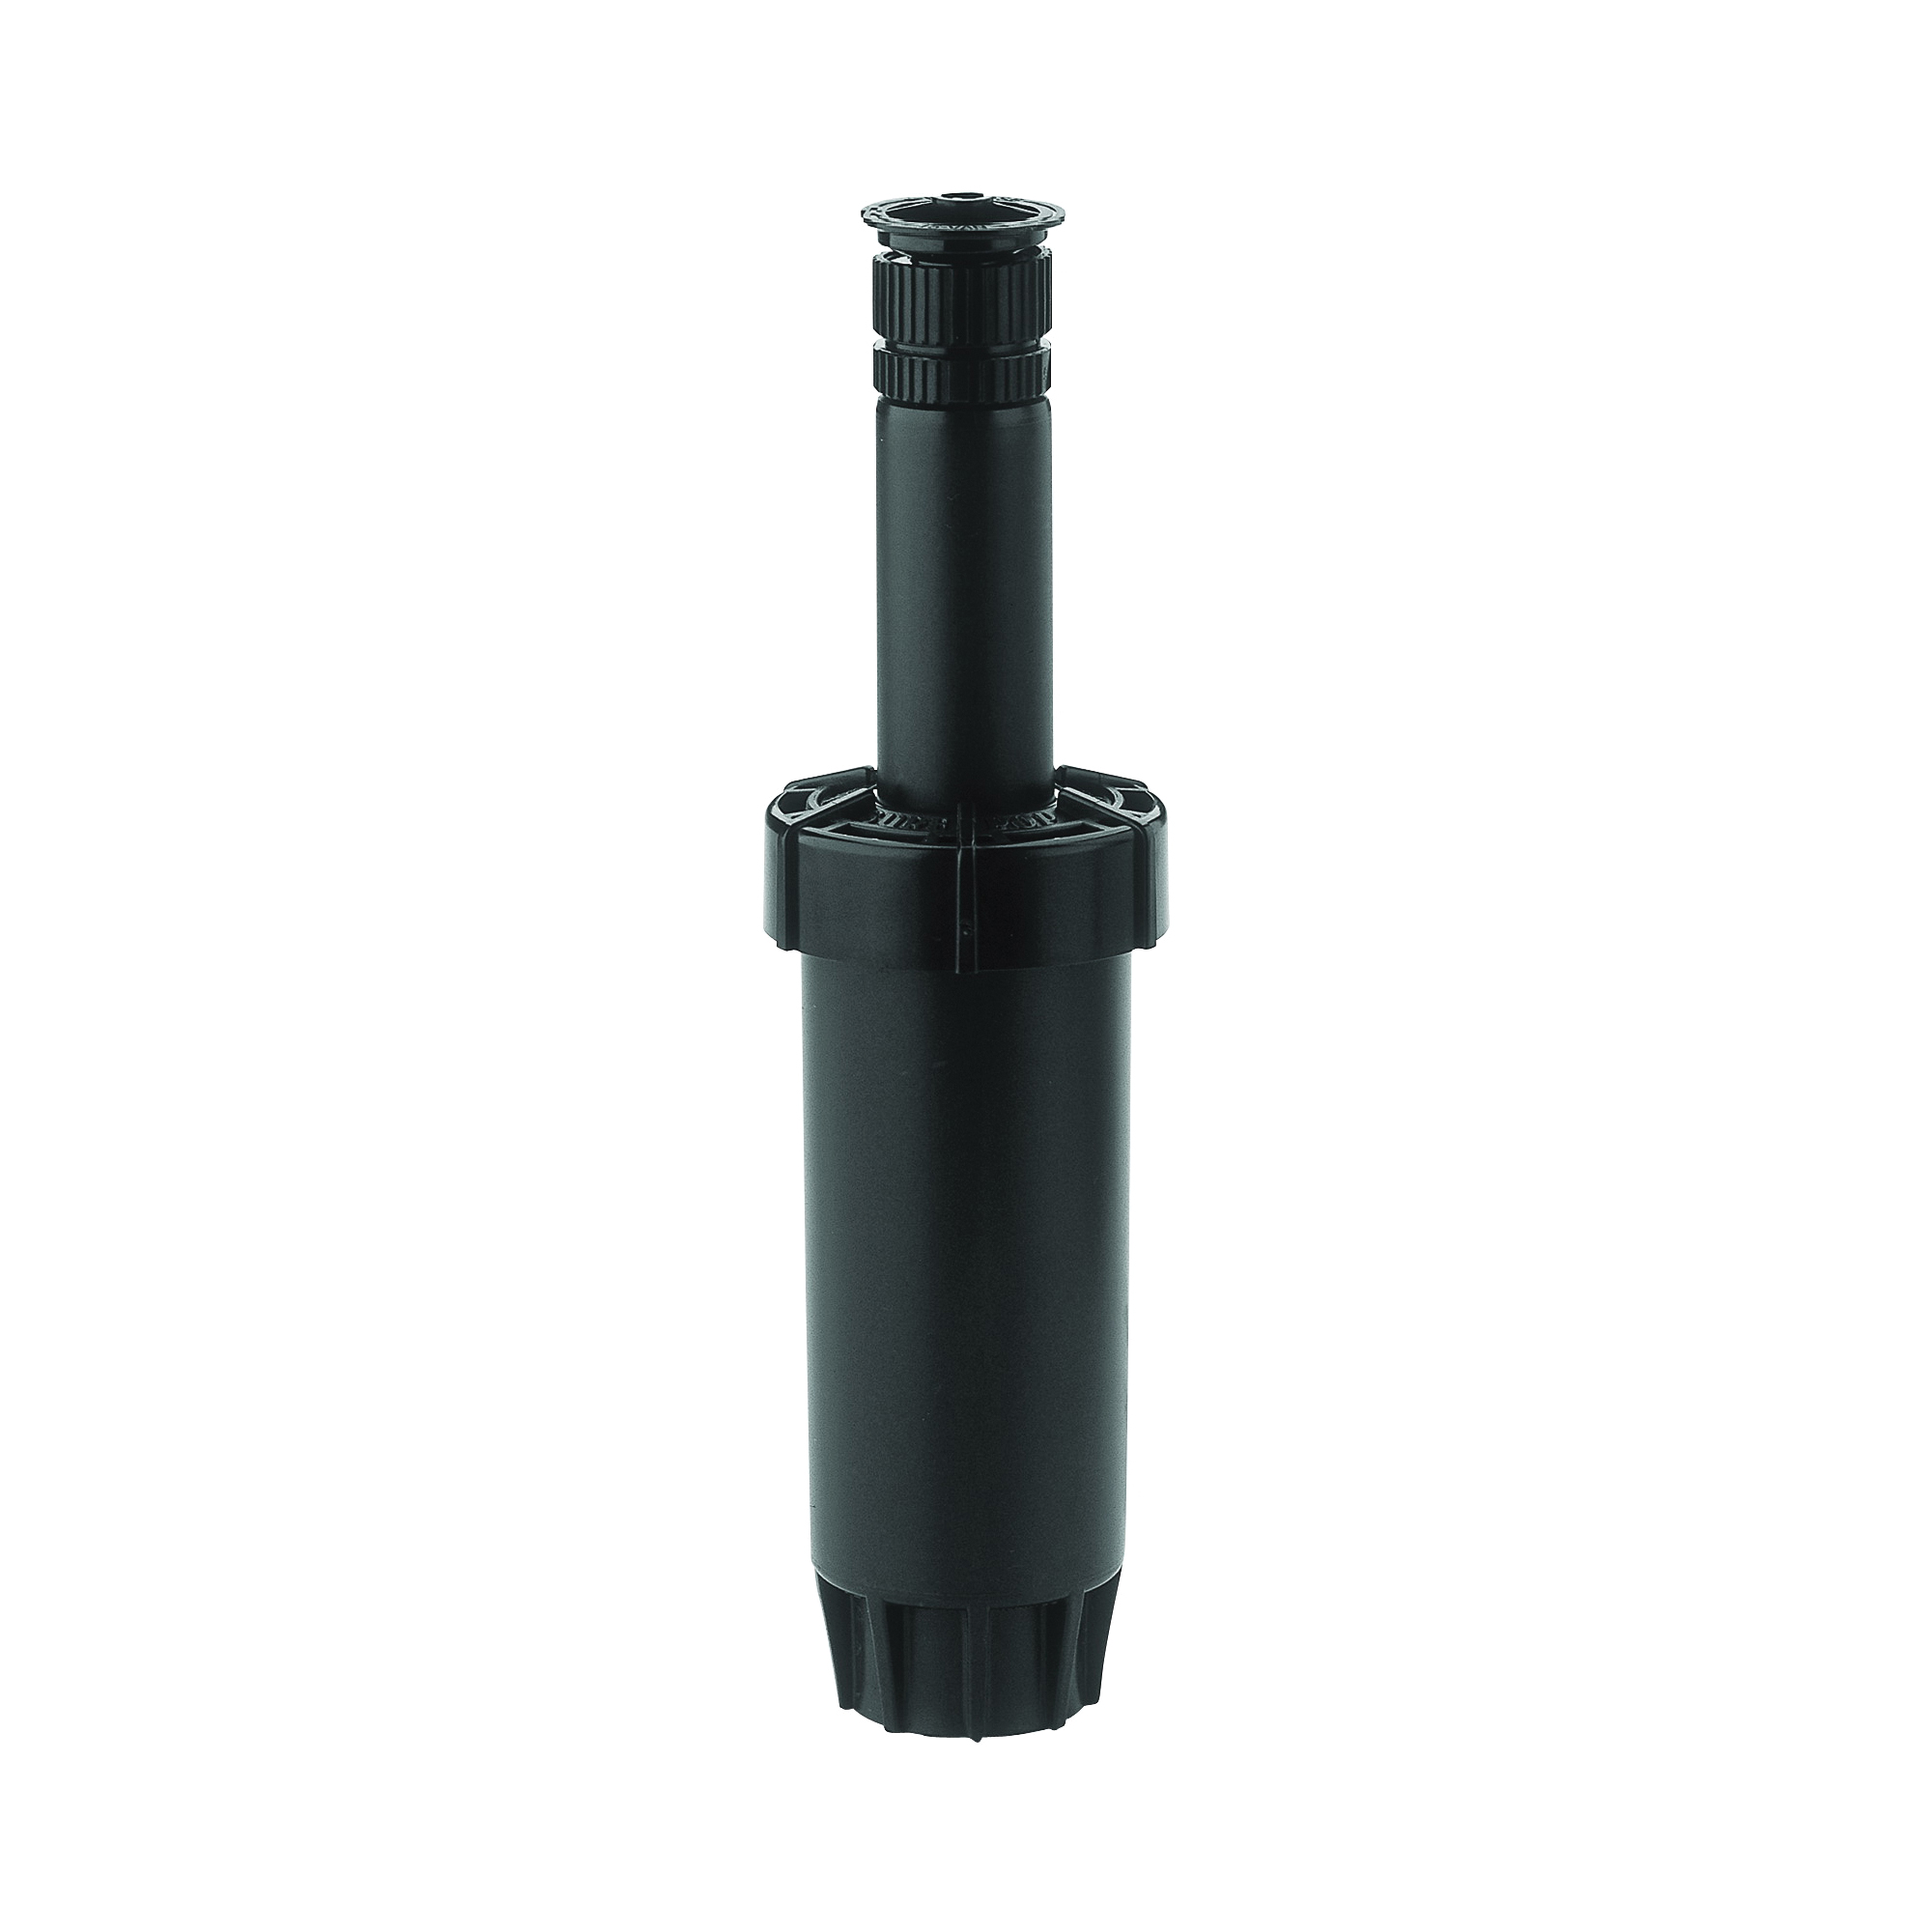 Picture of Rain Bird SP25HS Spray Head Sprinkler, 1/2 in Connection, FNPT, Plastic